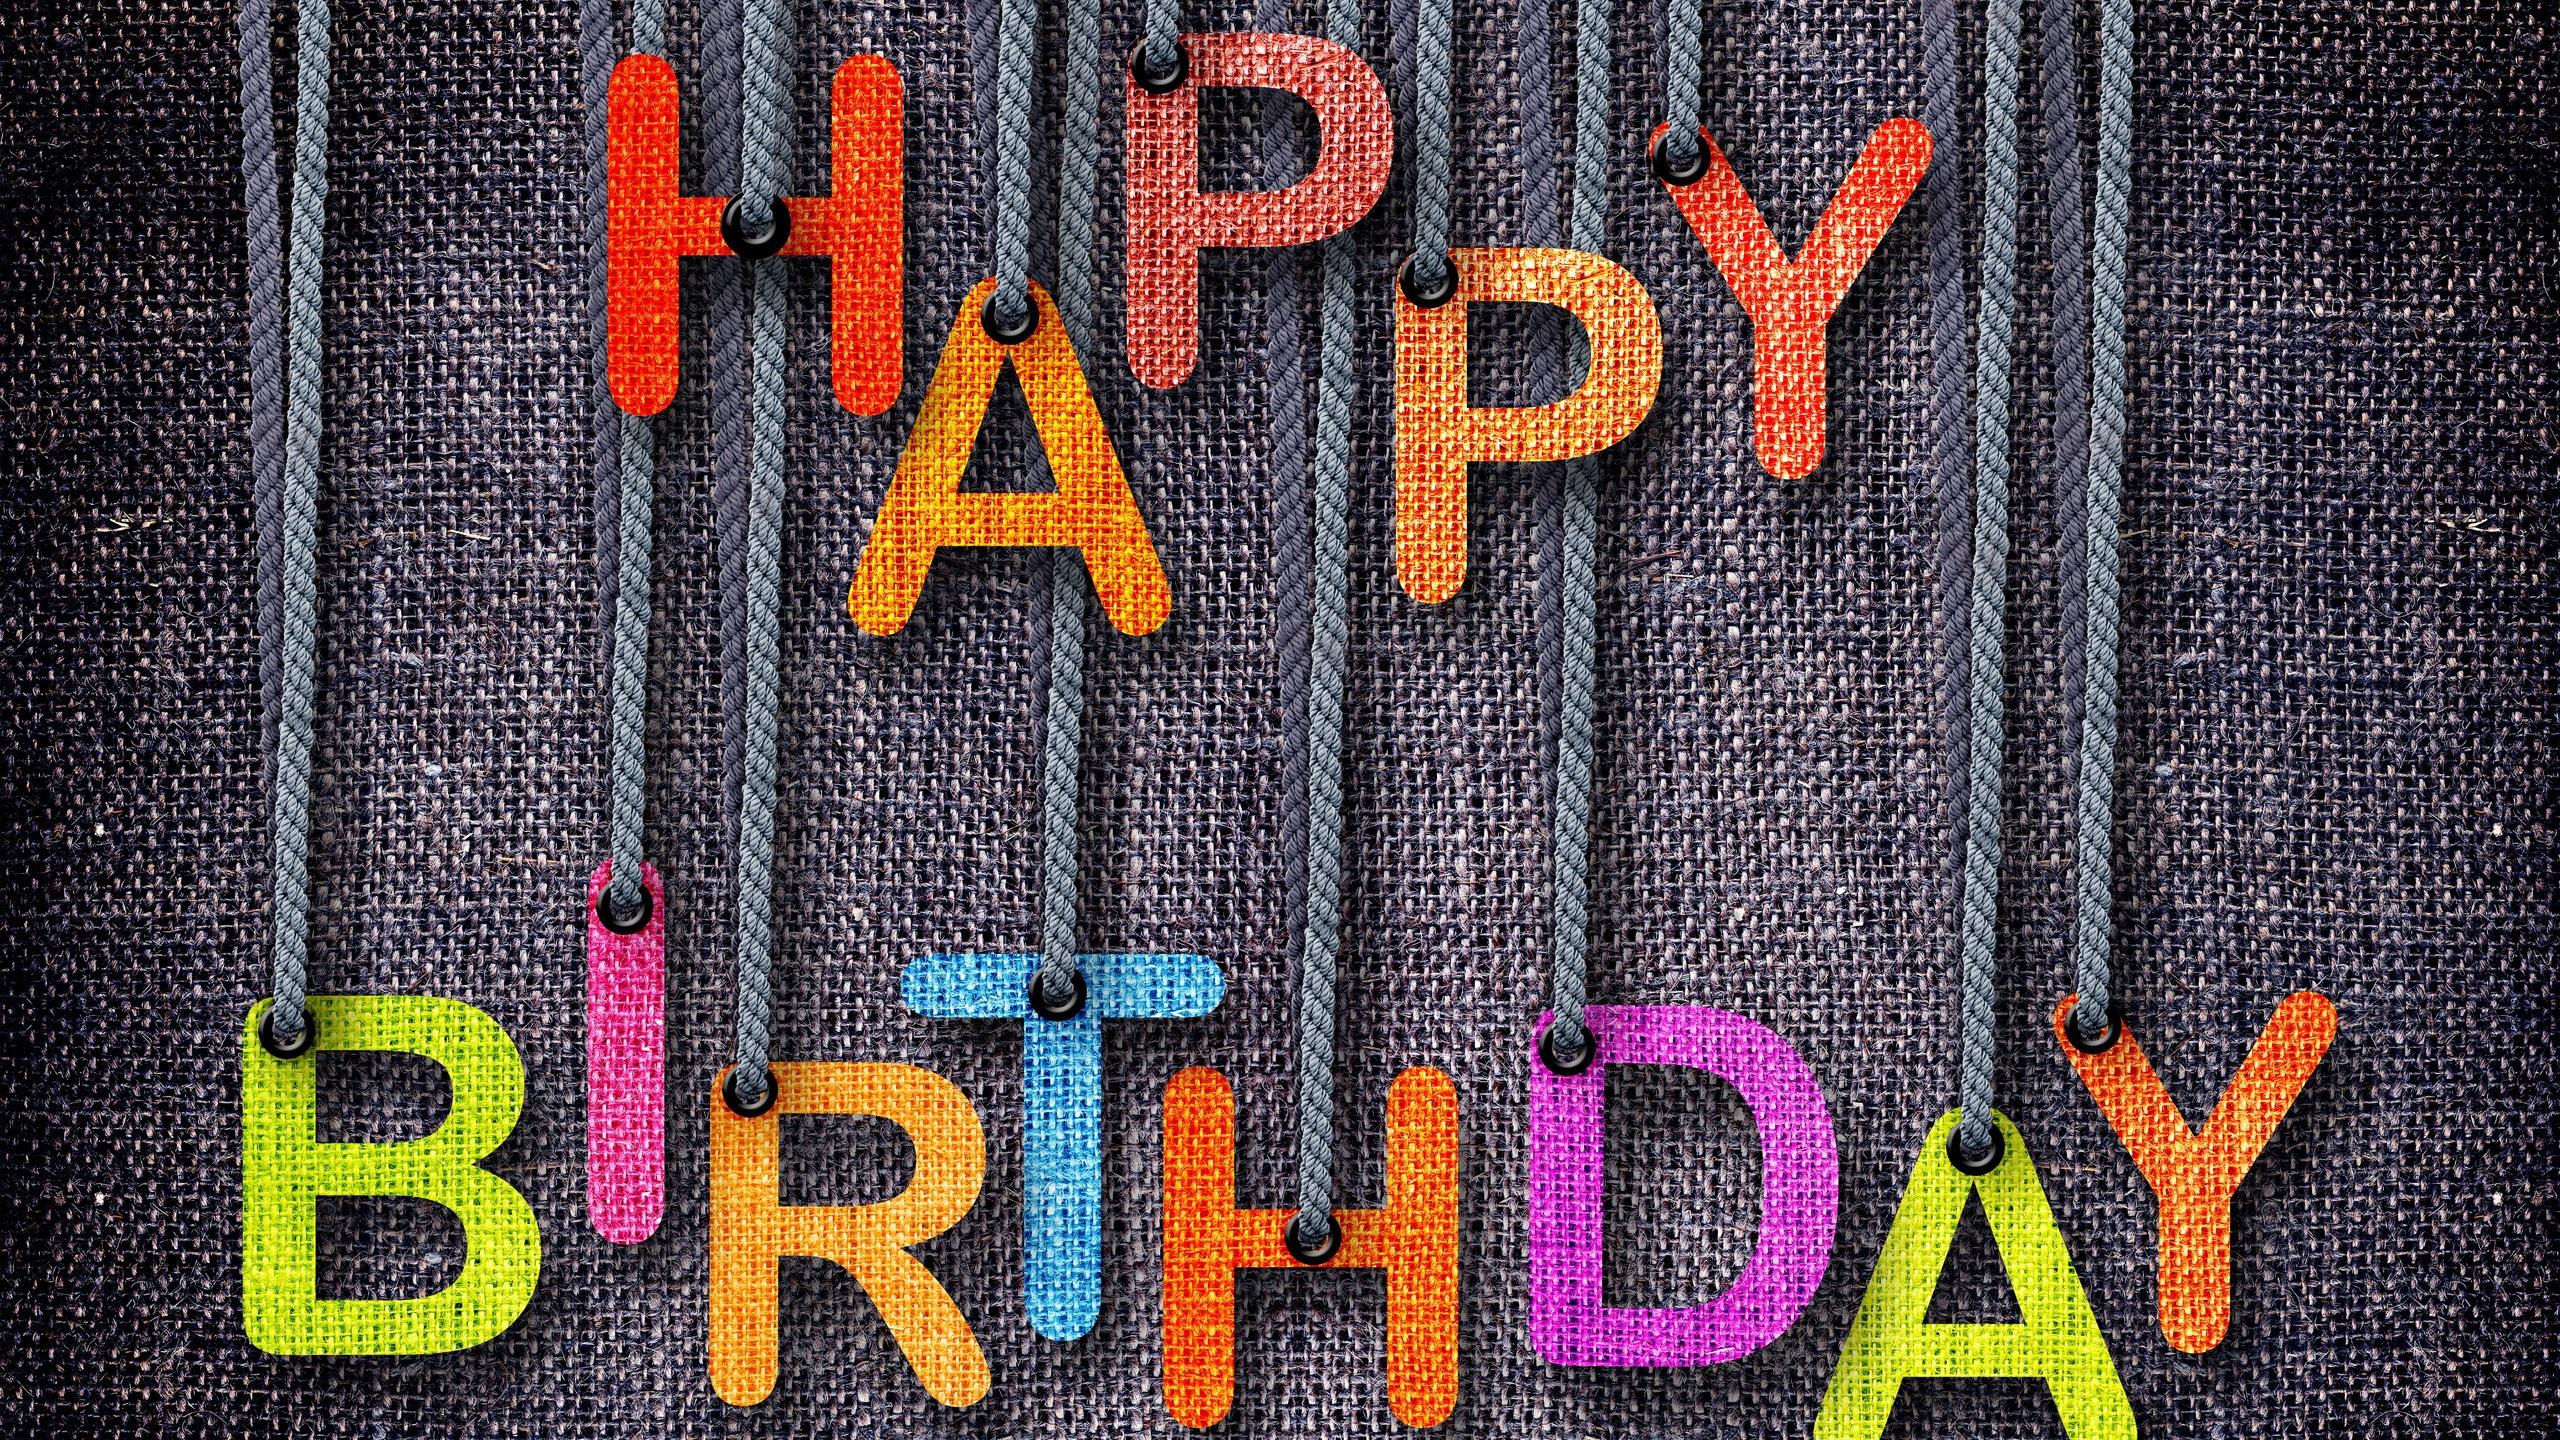 Fonds d 39 cran t l charger 2560x1440 joyeux anniversaire for Fond ecran qhd